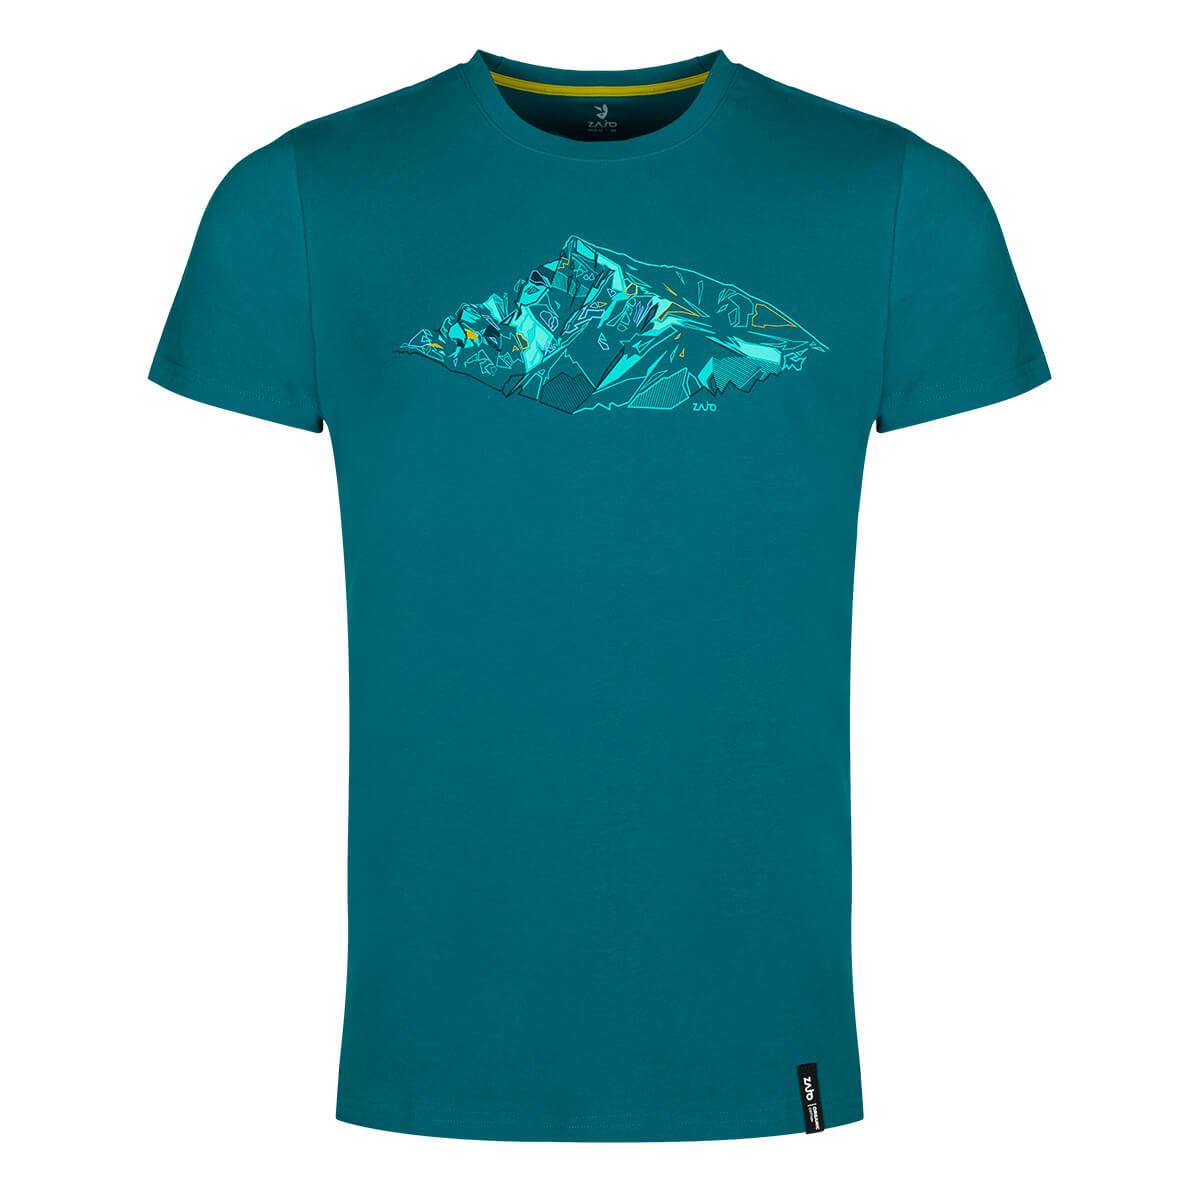 ZAJO Bormio T-Shirt SS pánske tričko Deep Lagoon Peak - veľkosť L